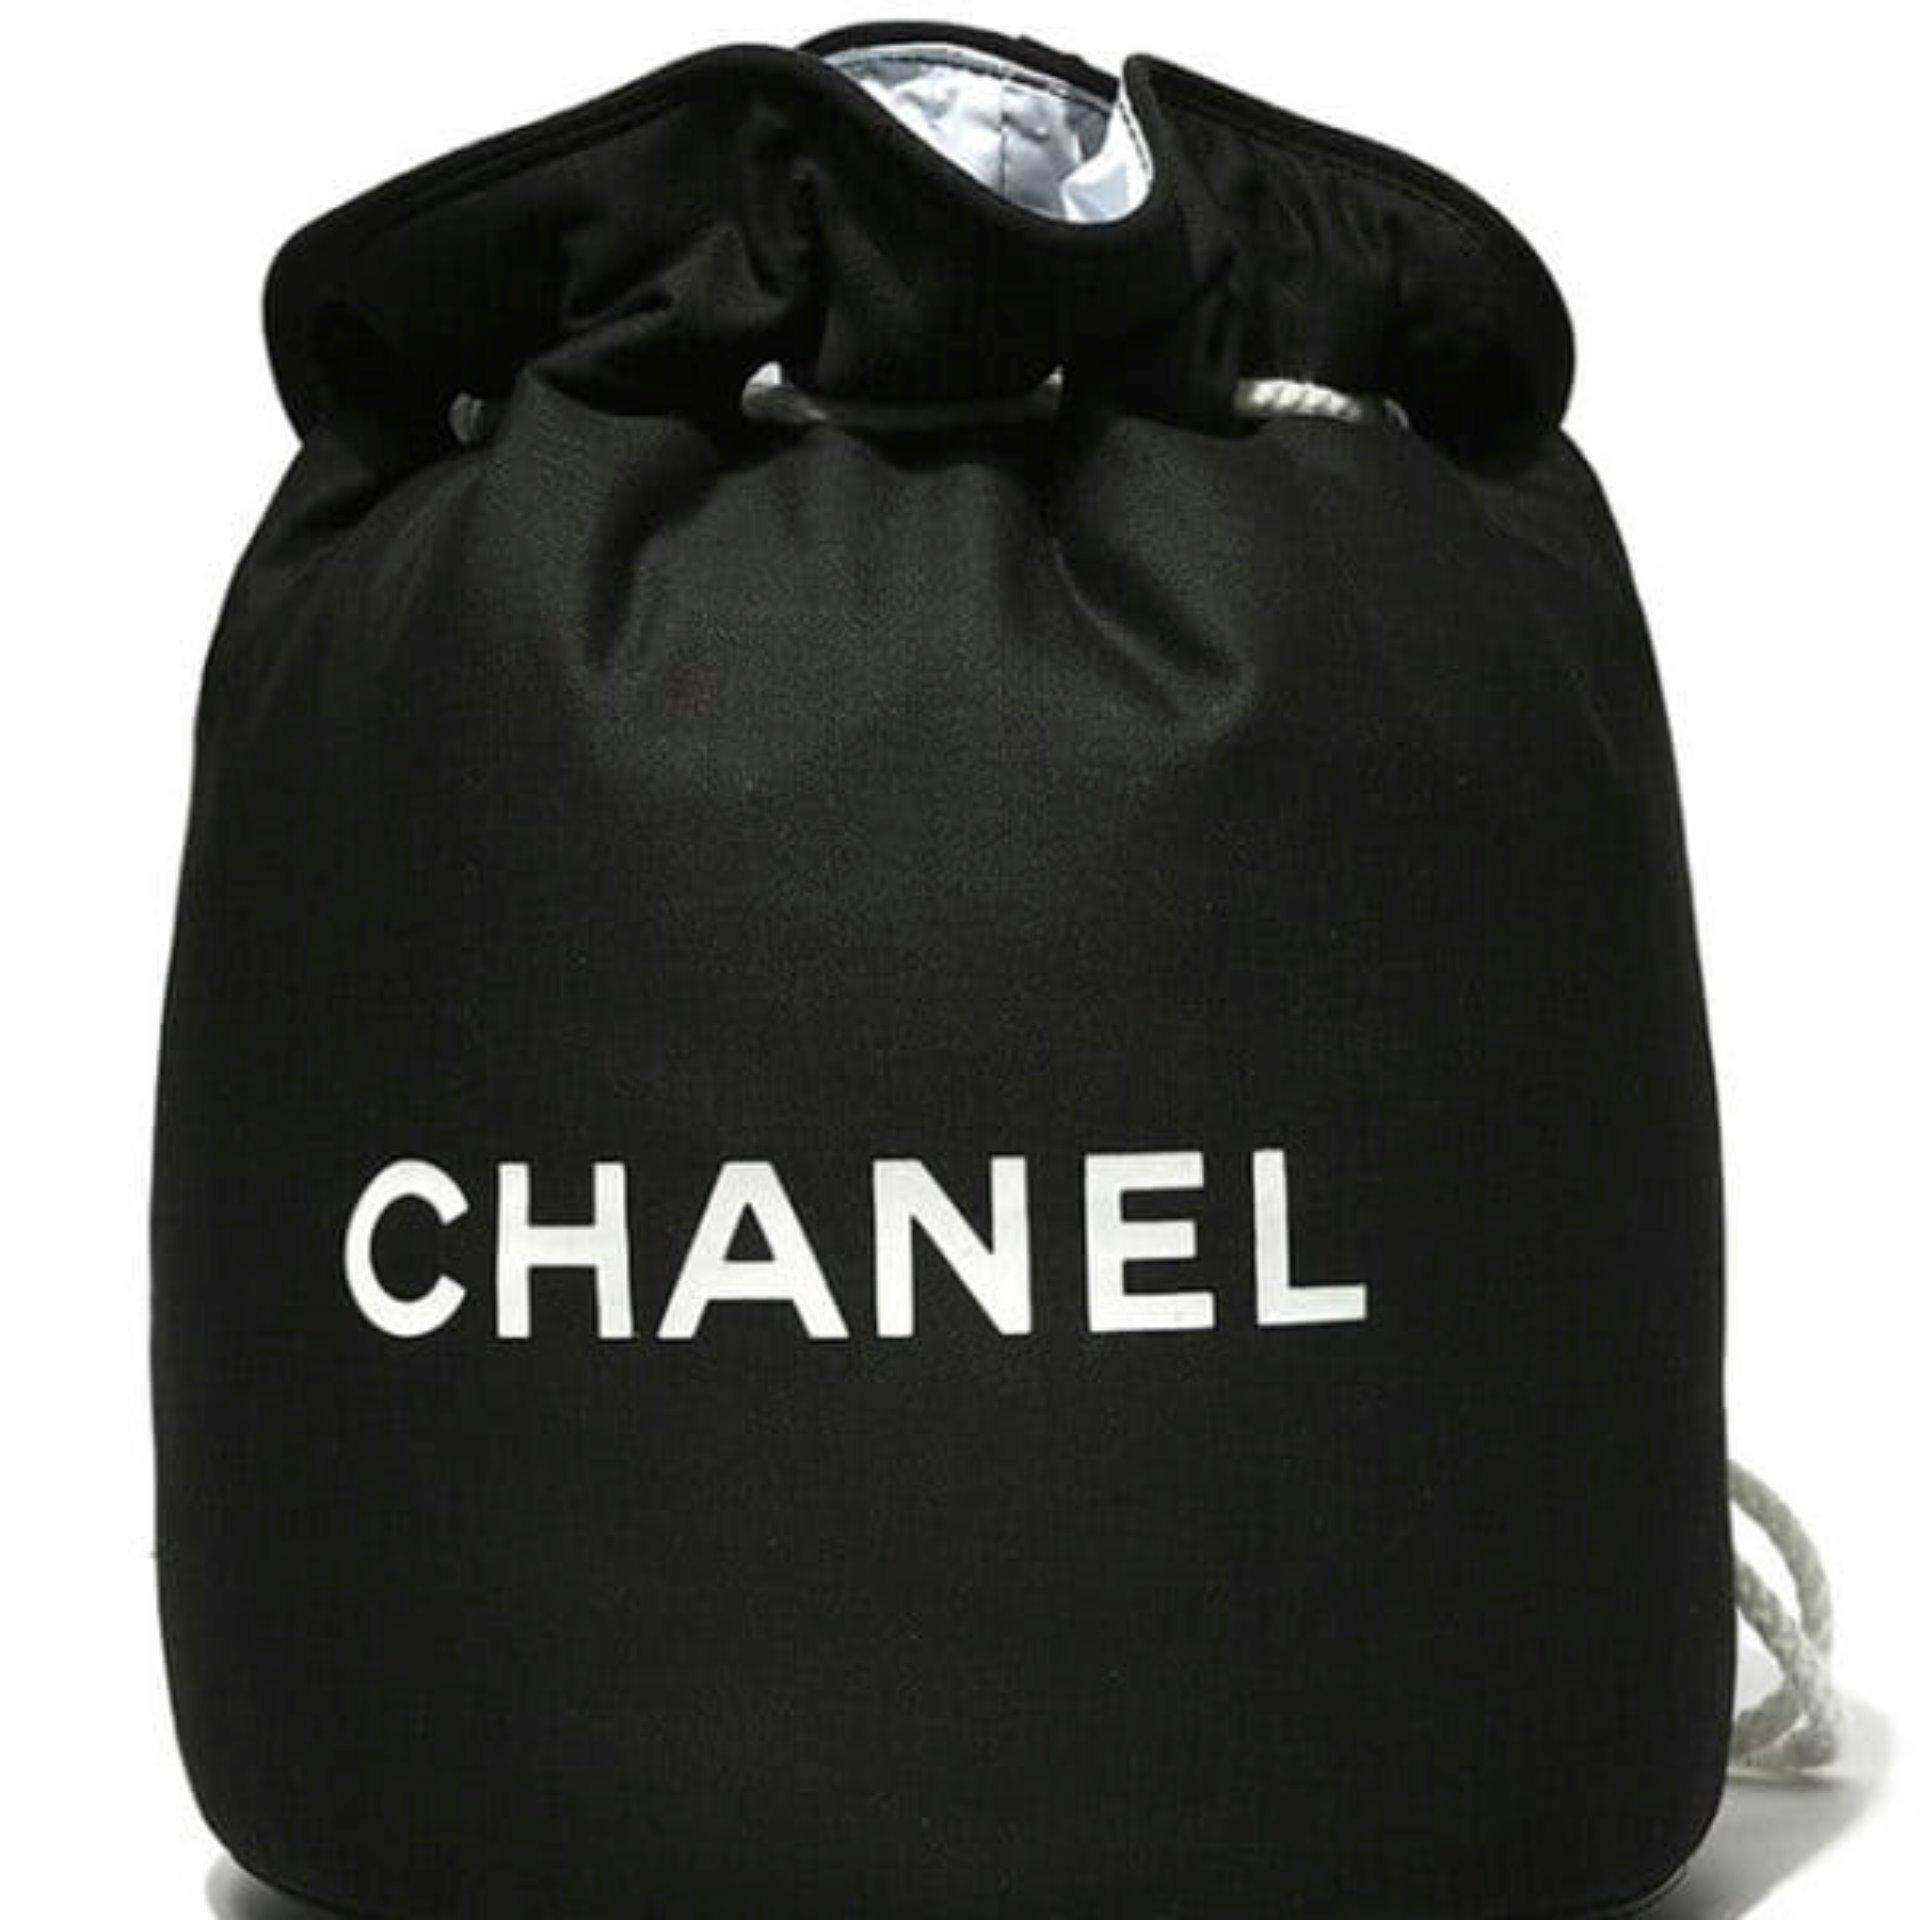 57508dd02f96 Authentic Chanel VIP gift Black Drawstring Bucket Bag